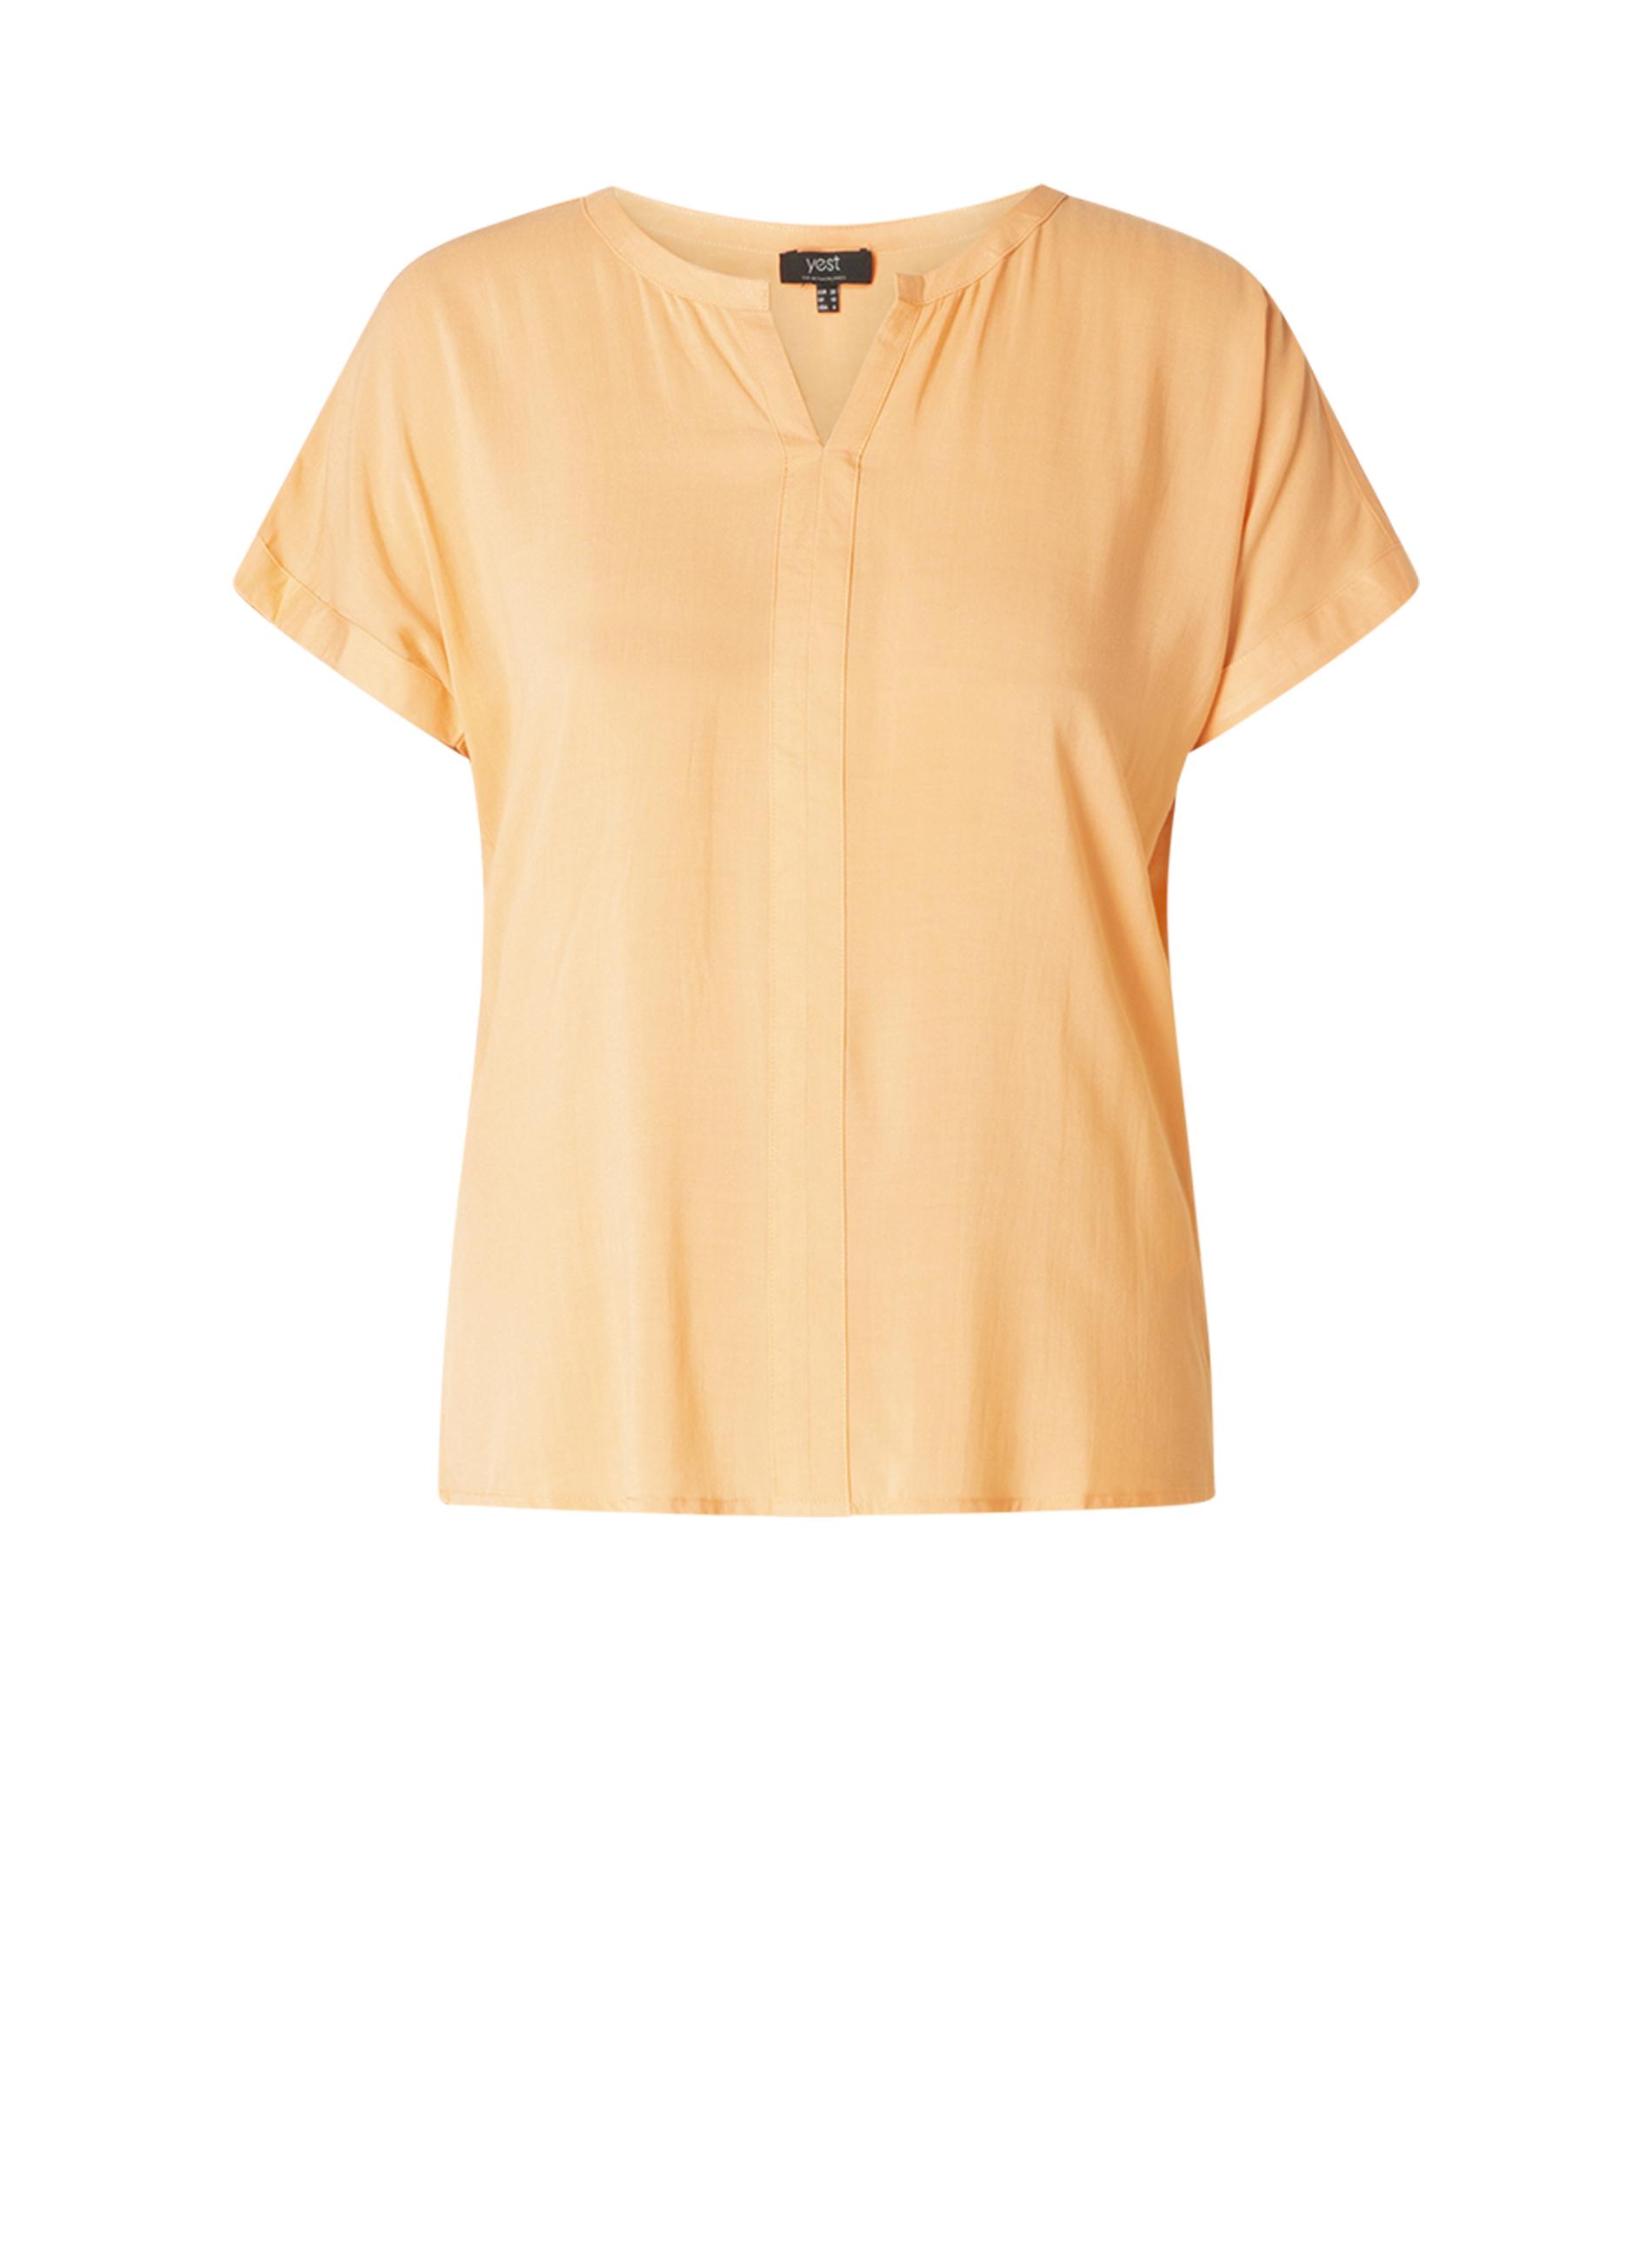 Yesta blouse Liara 78 cm